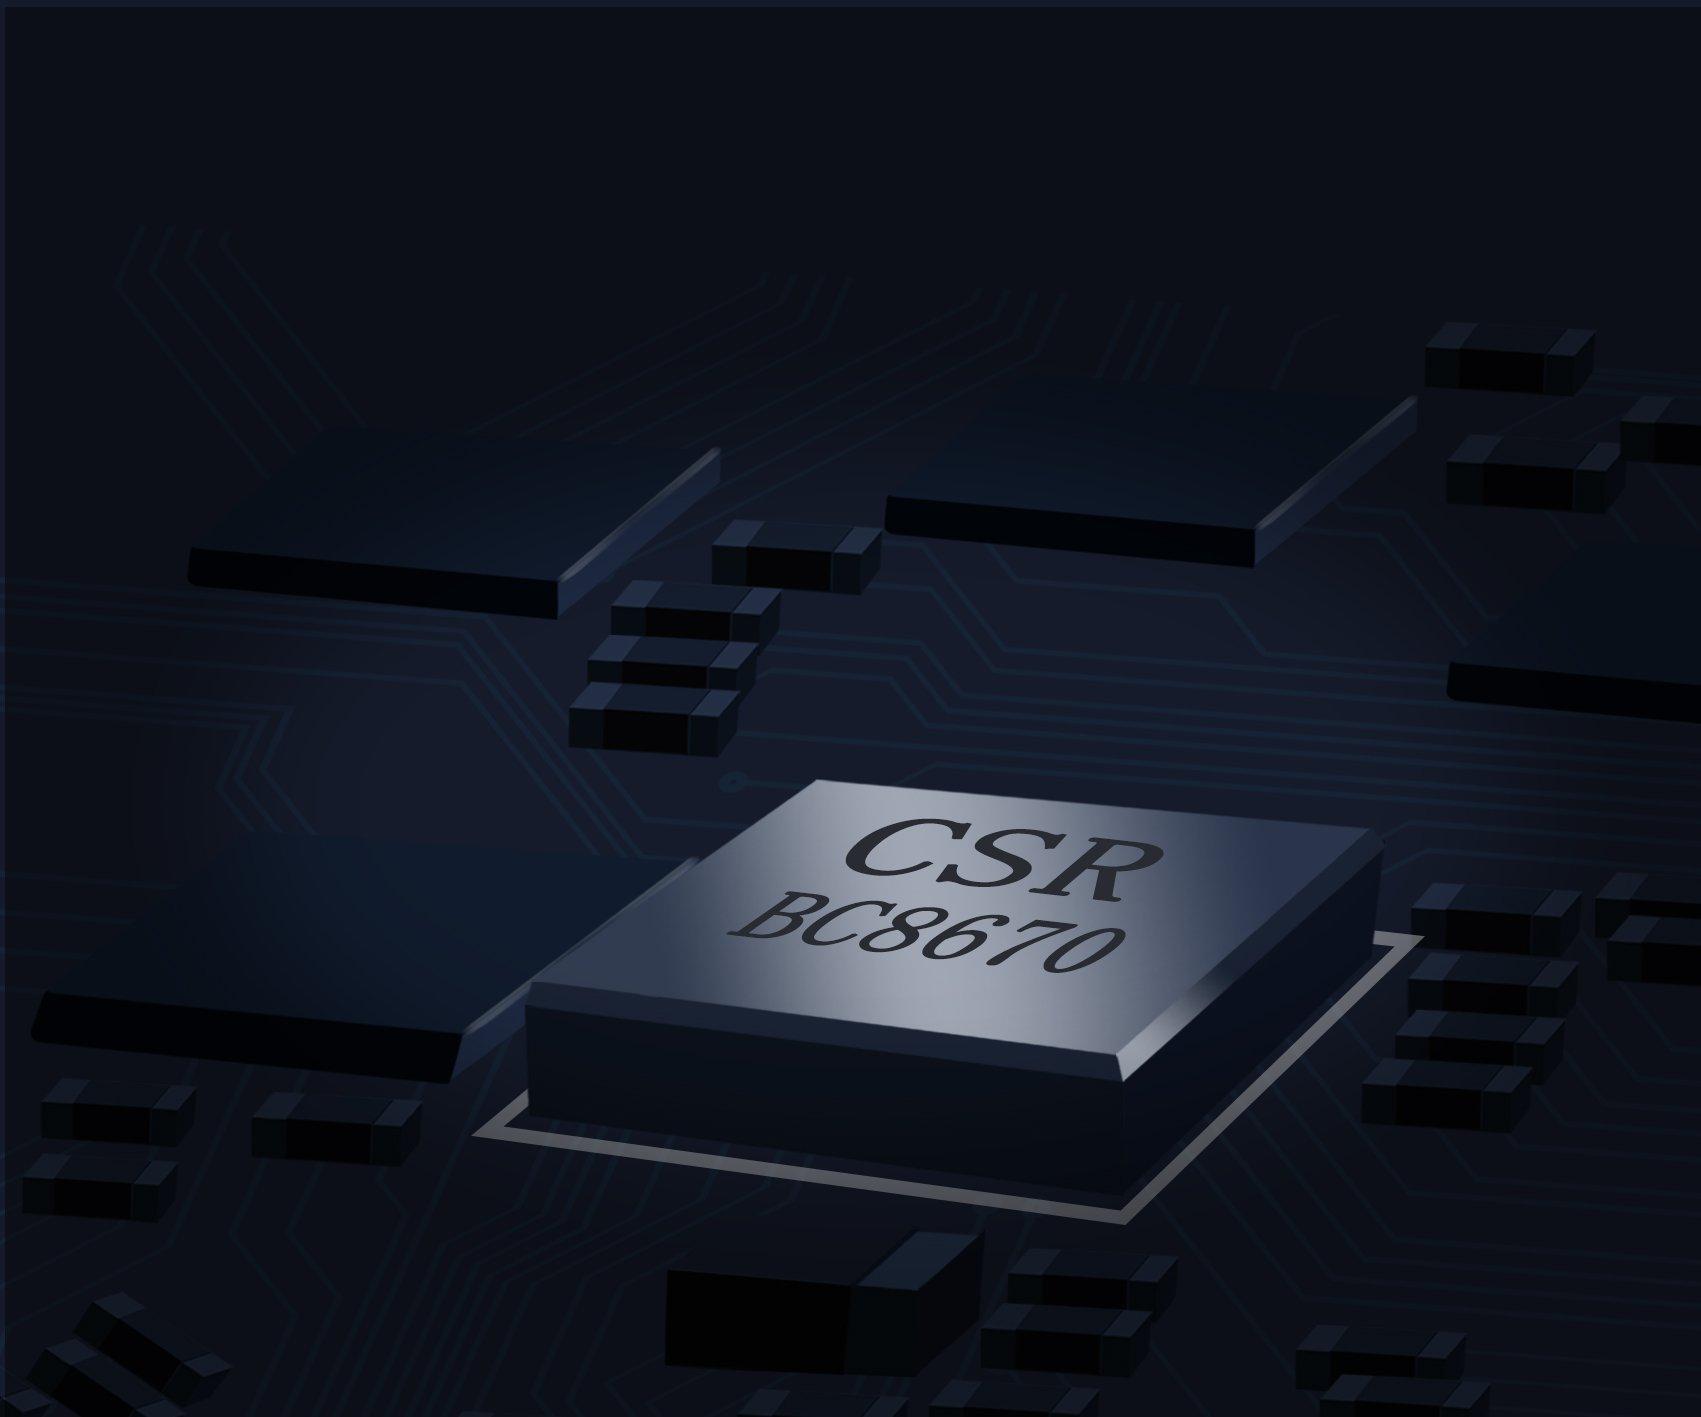 Bluetooth-Empfnger-iAmotus-Bluetooth-Adapter-Drahtlos-V42-Tragbare-Audio-Kabellose-Bluetooth-Receiver-bernehmen-Auto-Lautsprechersystem-Handy-mit-Stereo-35-mm-Aux-CSR-Chip